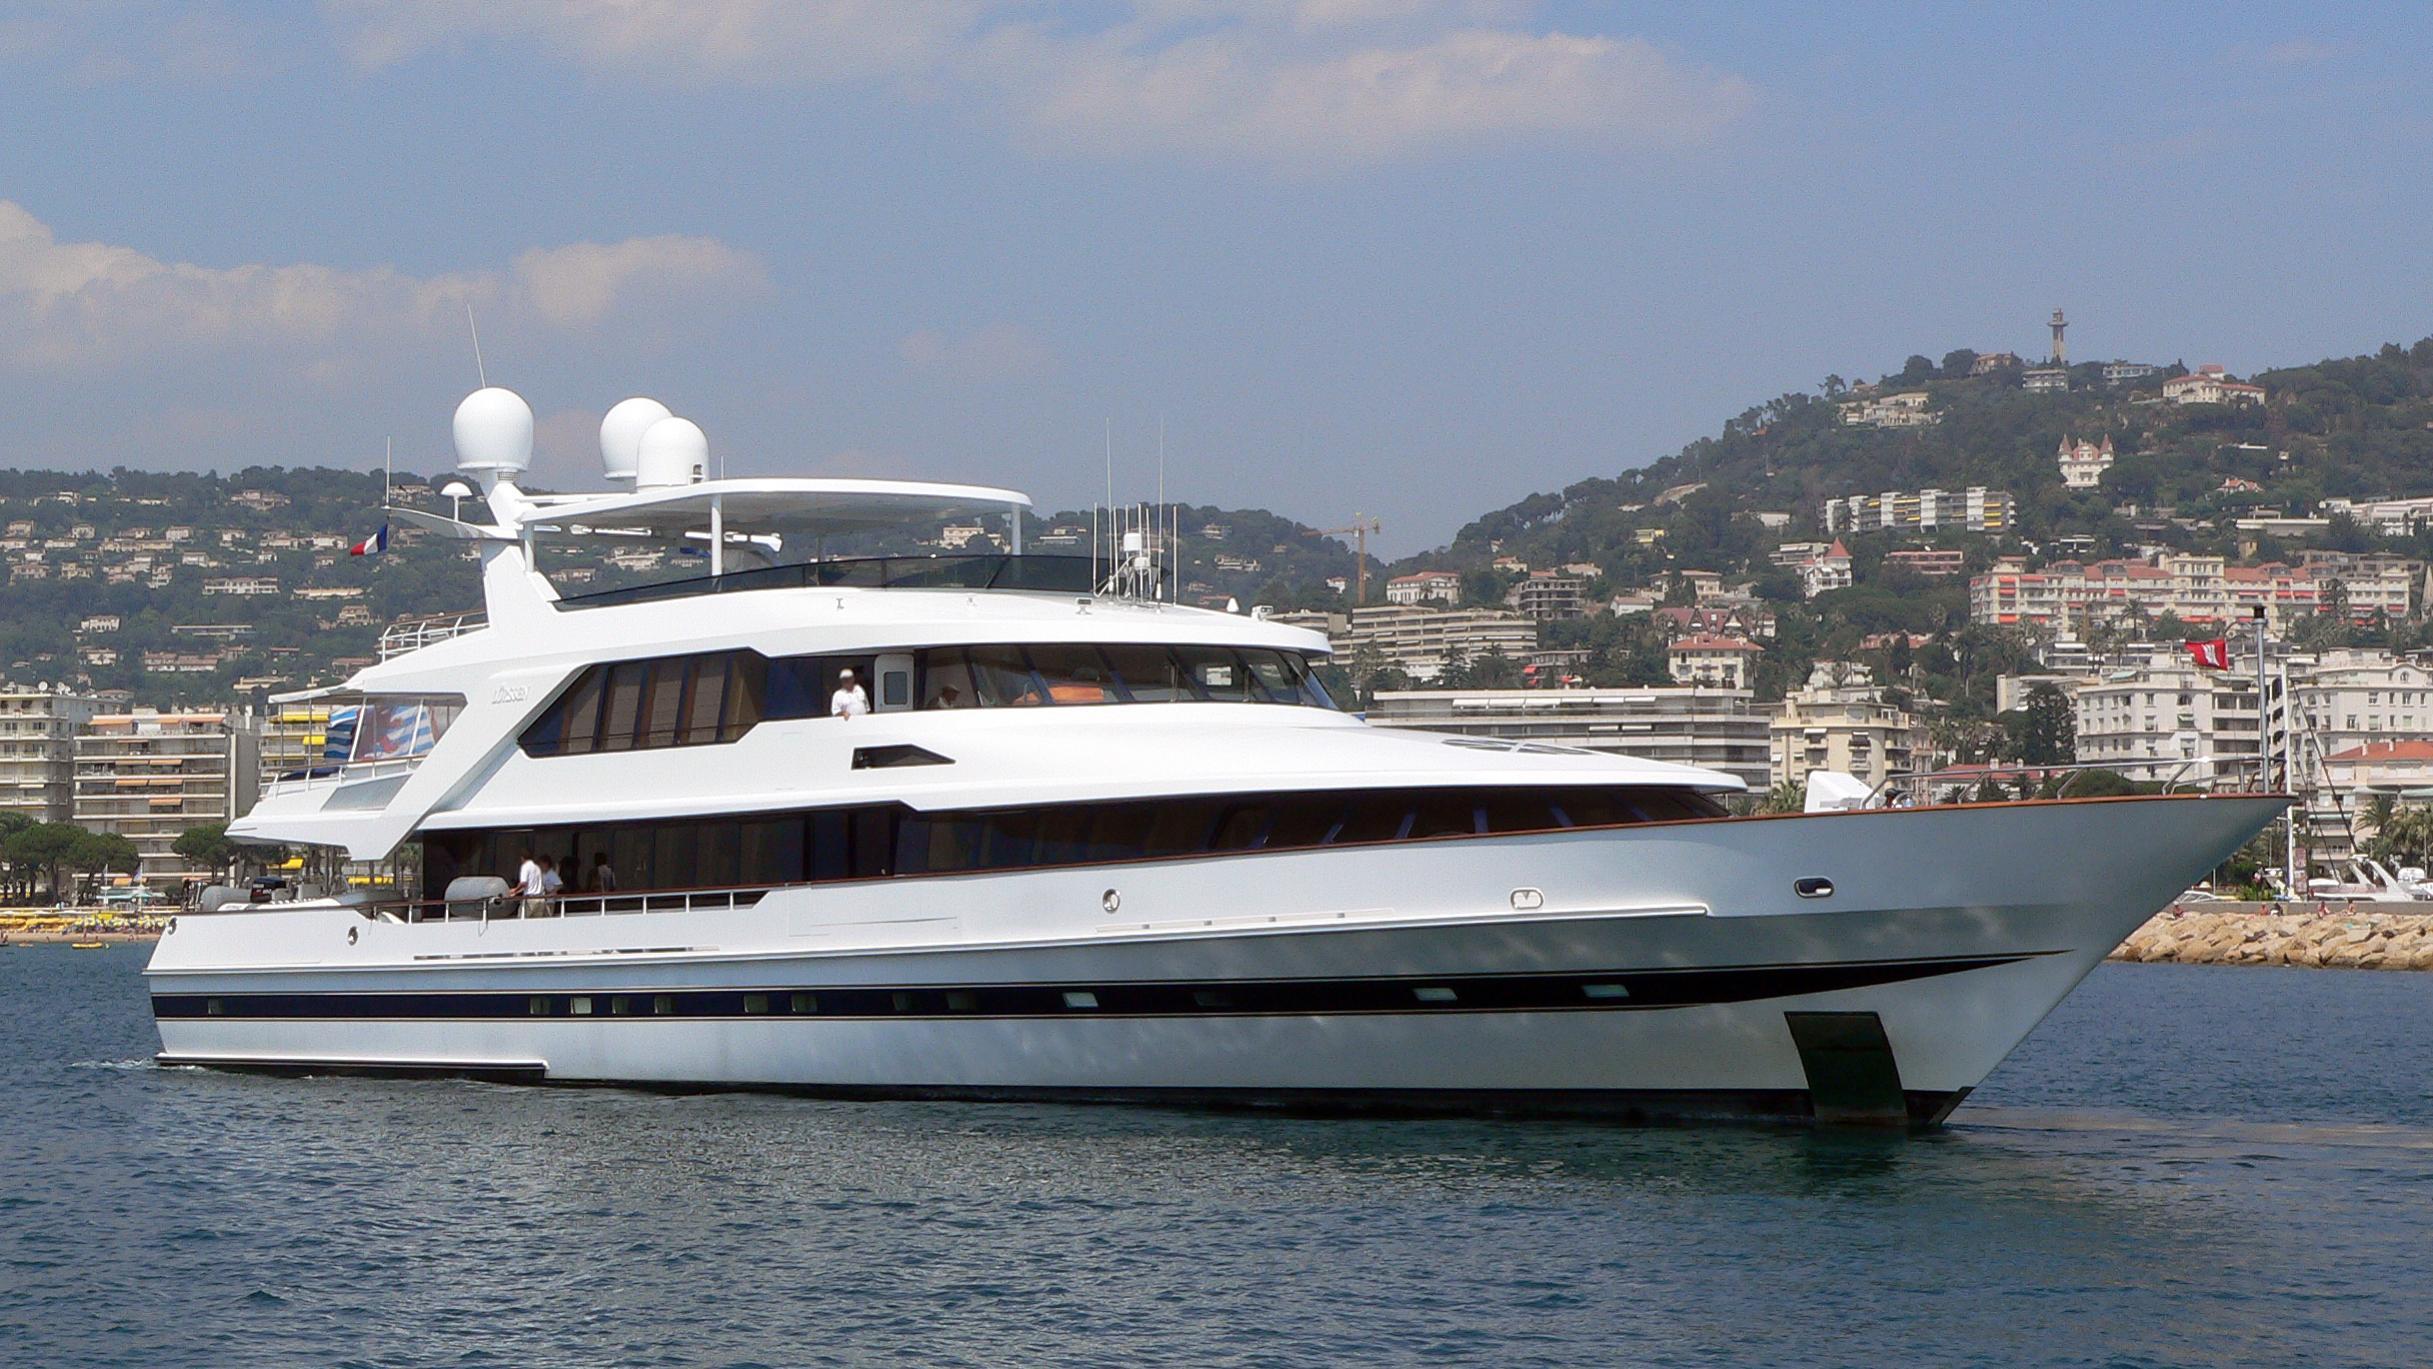 ontario-motor-yacht-lurssen-1992-46m-profile